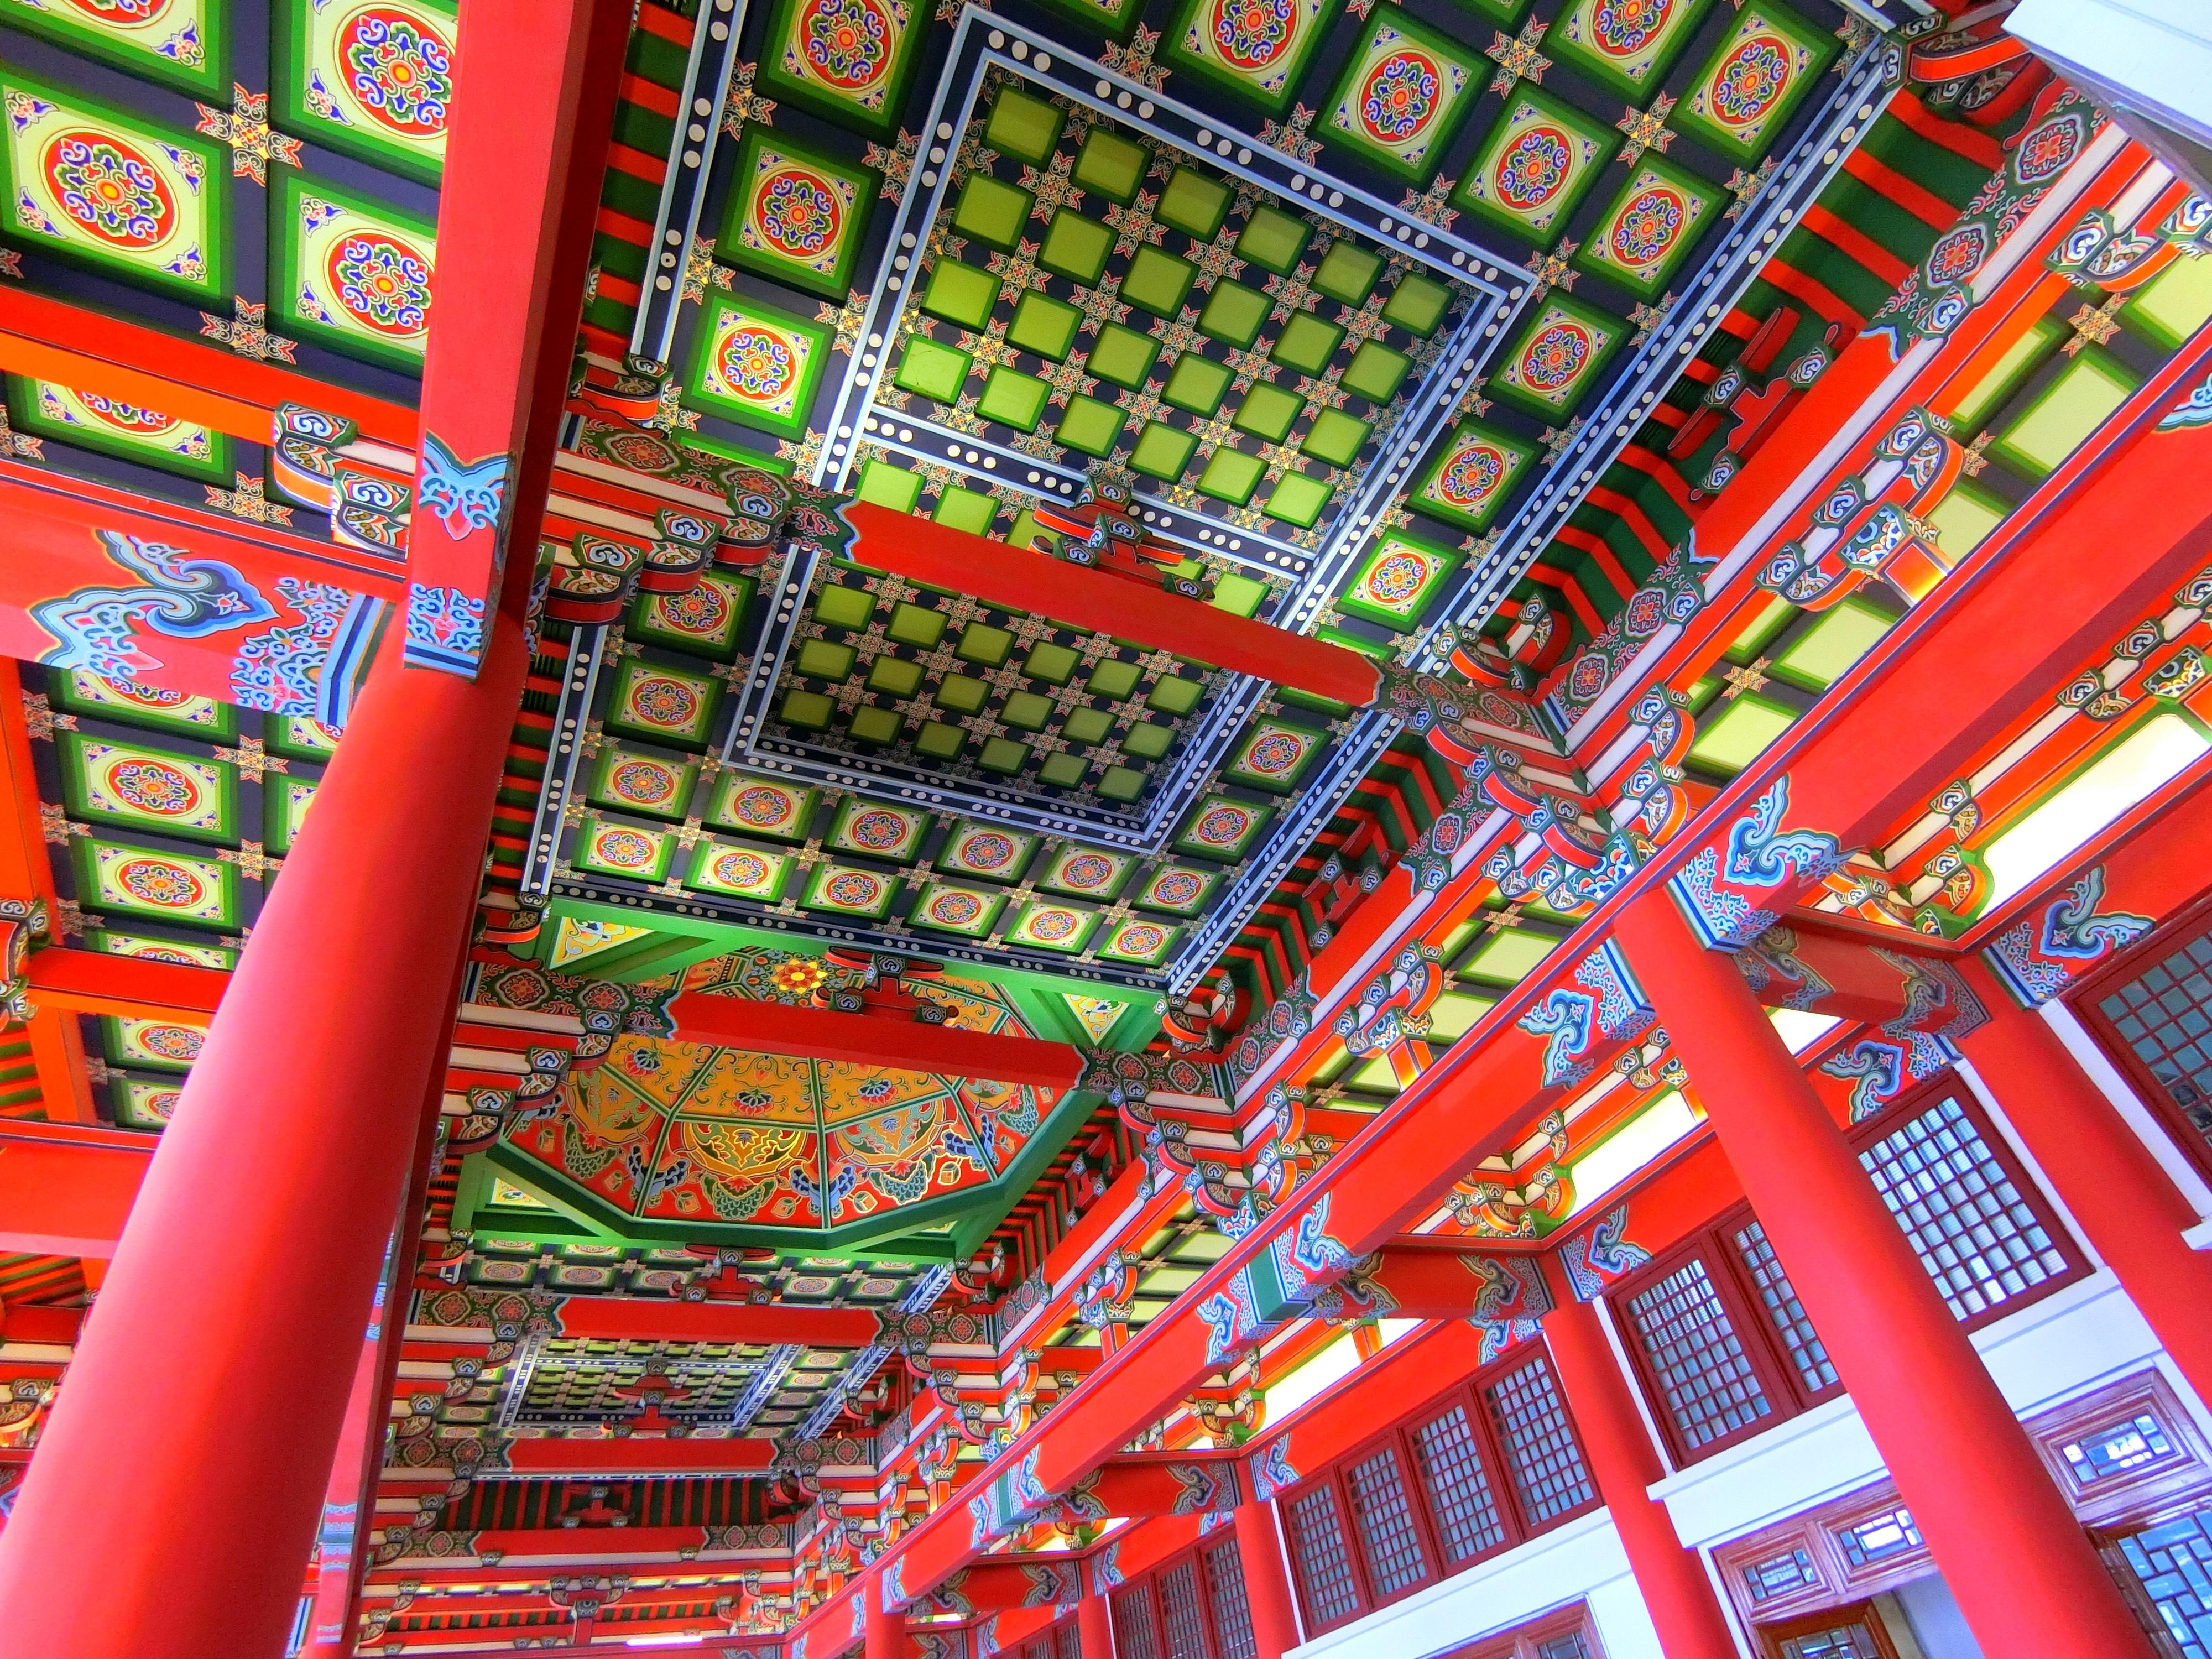 南京博物馆 Nanjing Museum